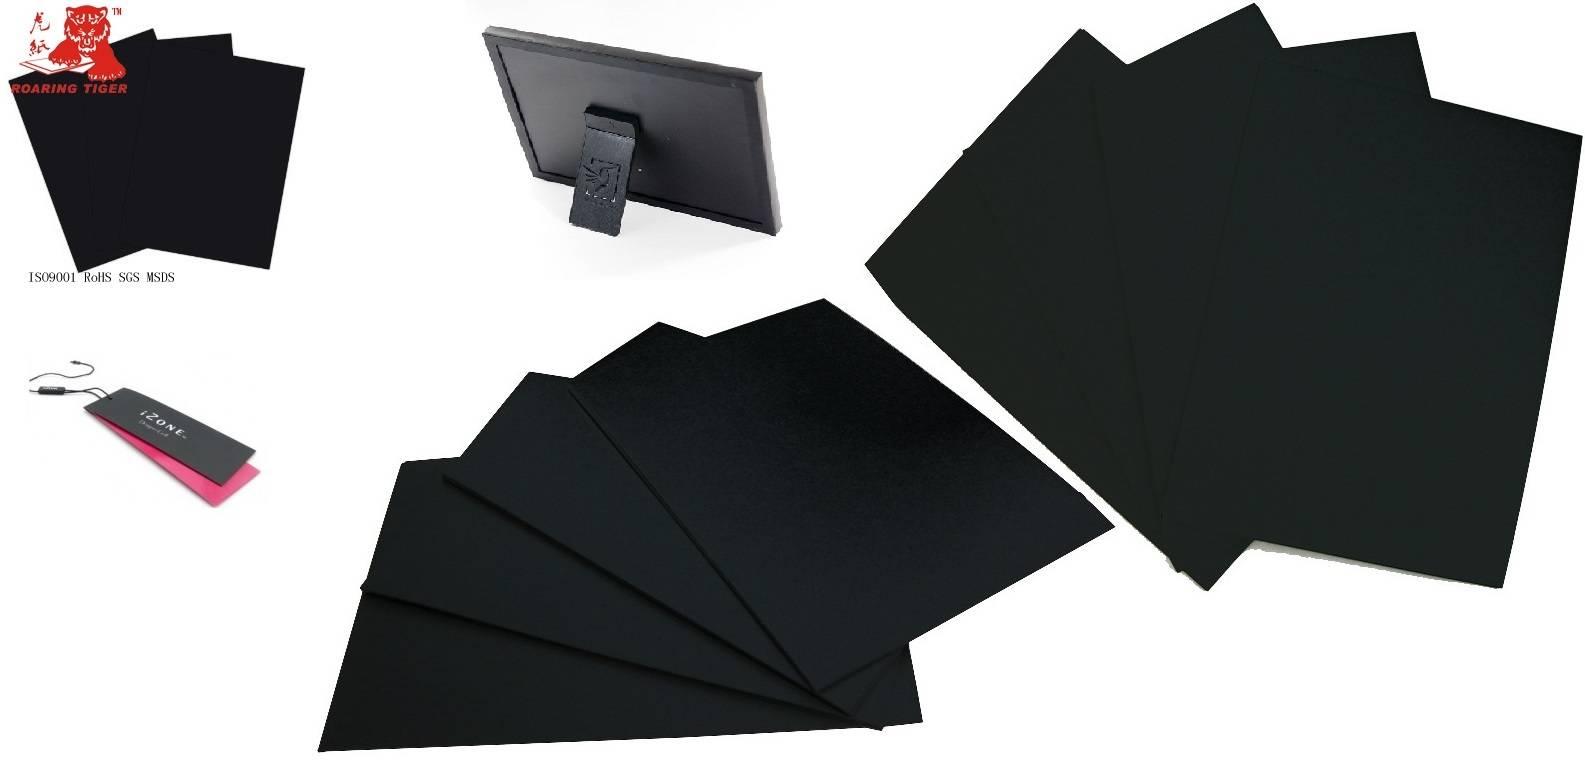 China black paper board/laminated cardboard/paperboard 650g 700g 750g 800g 850g 900g 950g 1000g 1050